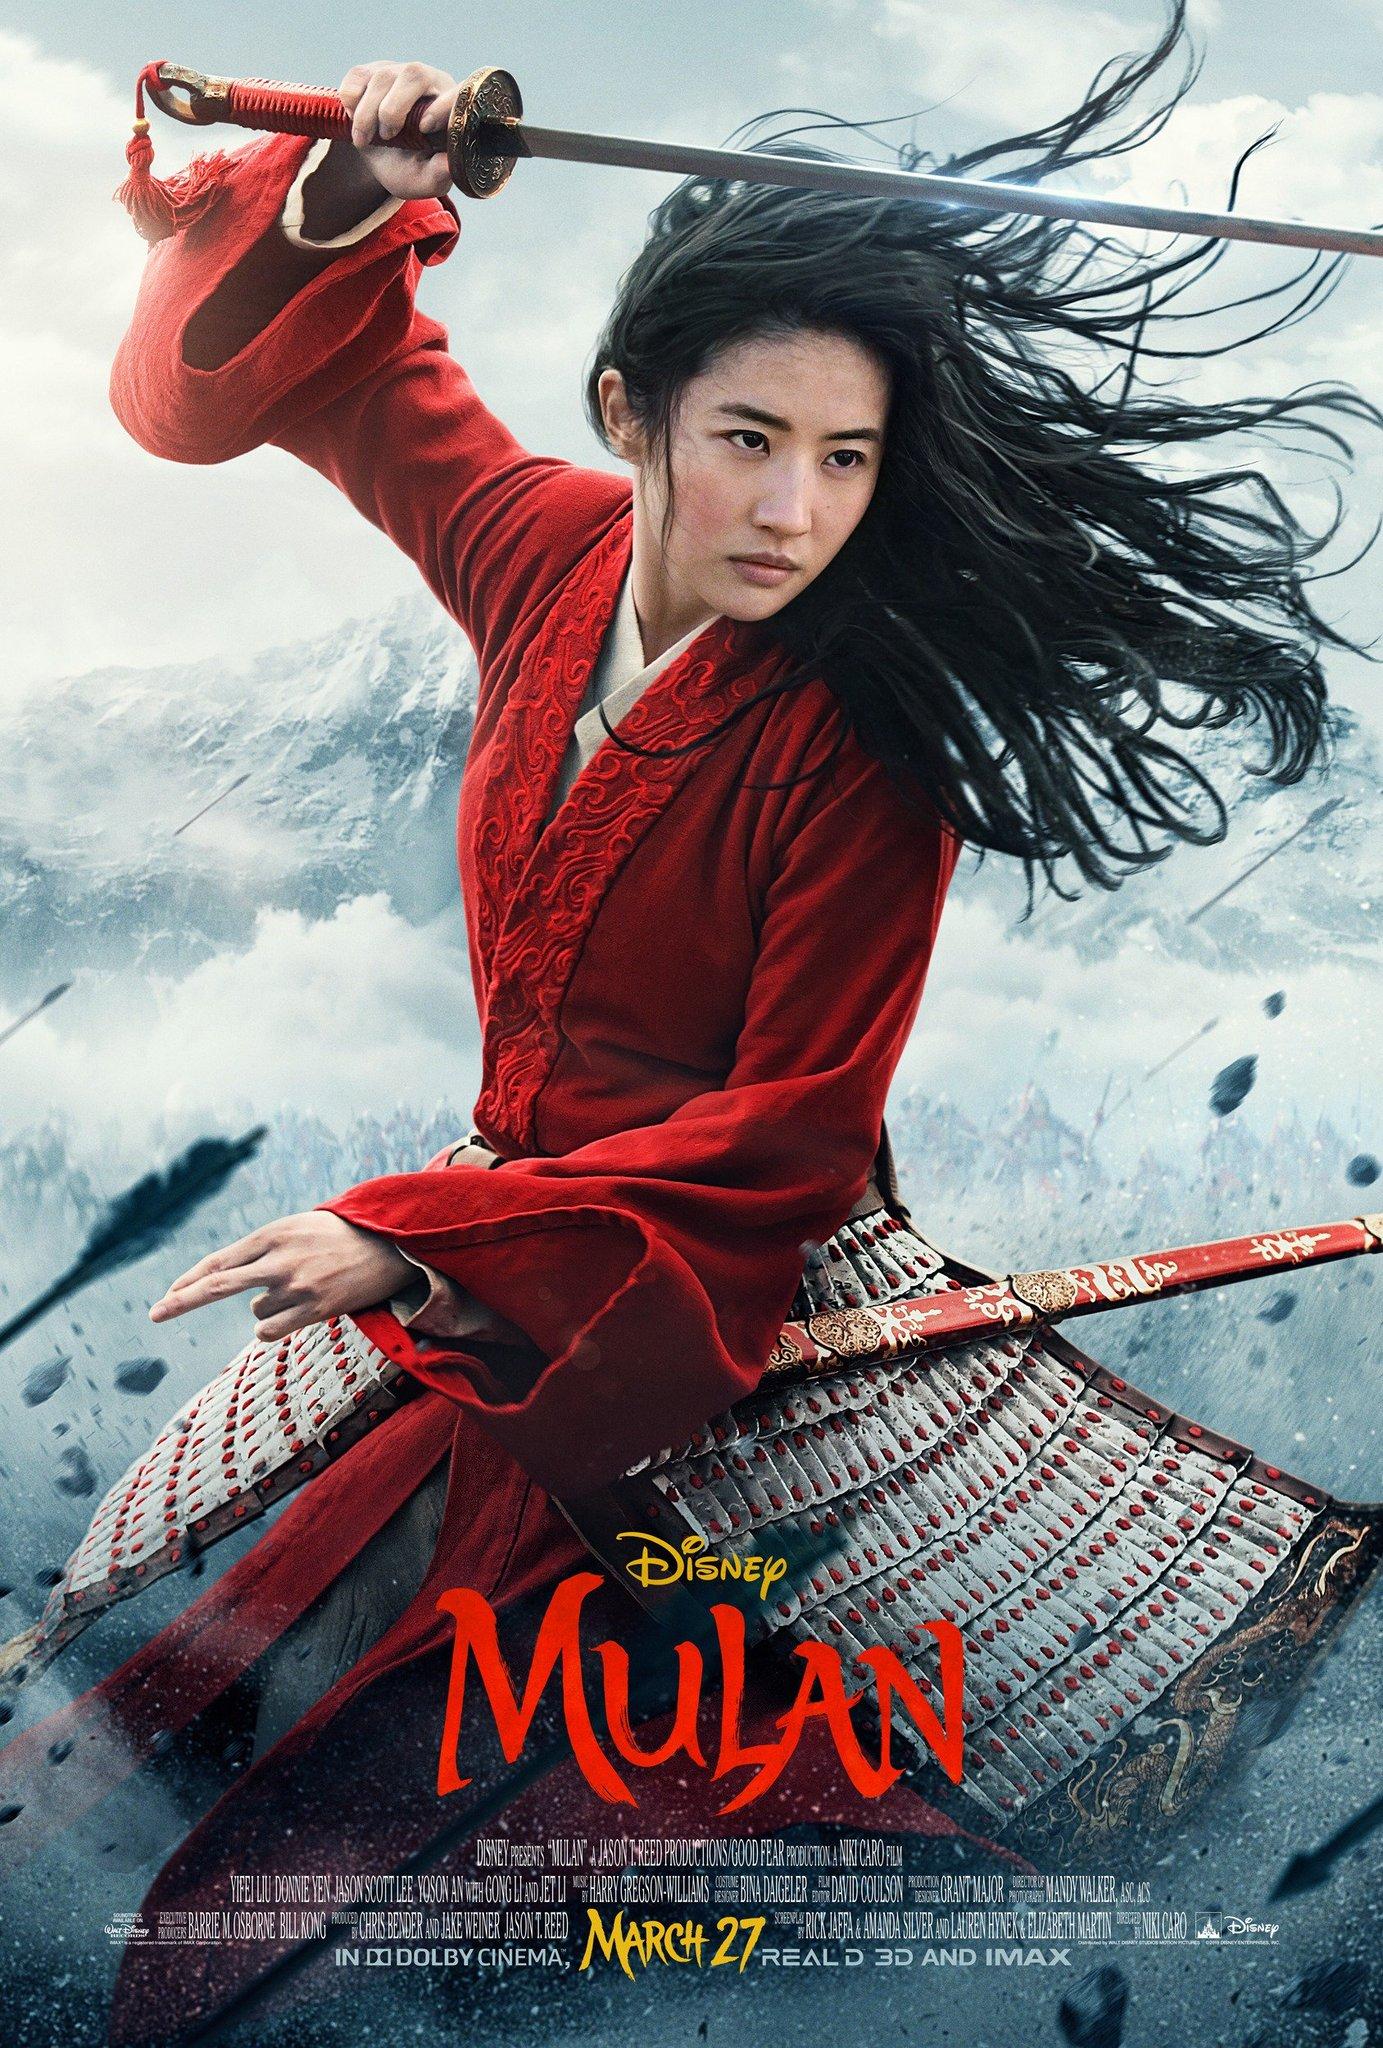 Mulan [Disney - 2020] - Page 12 EK9_iPGXYAEAx4u?format=jpg&name=4096x4096